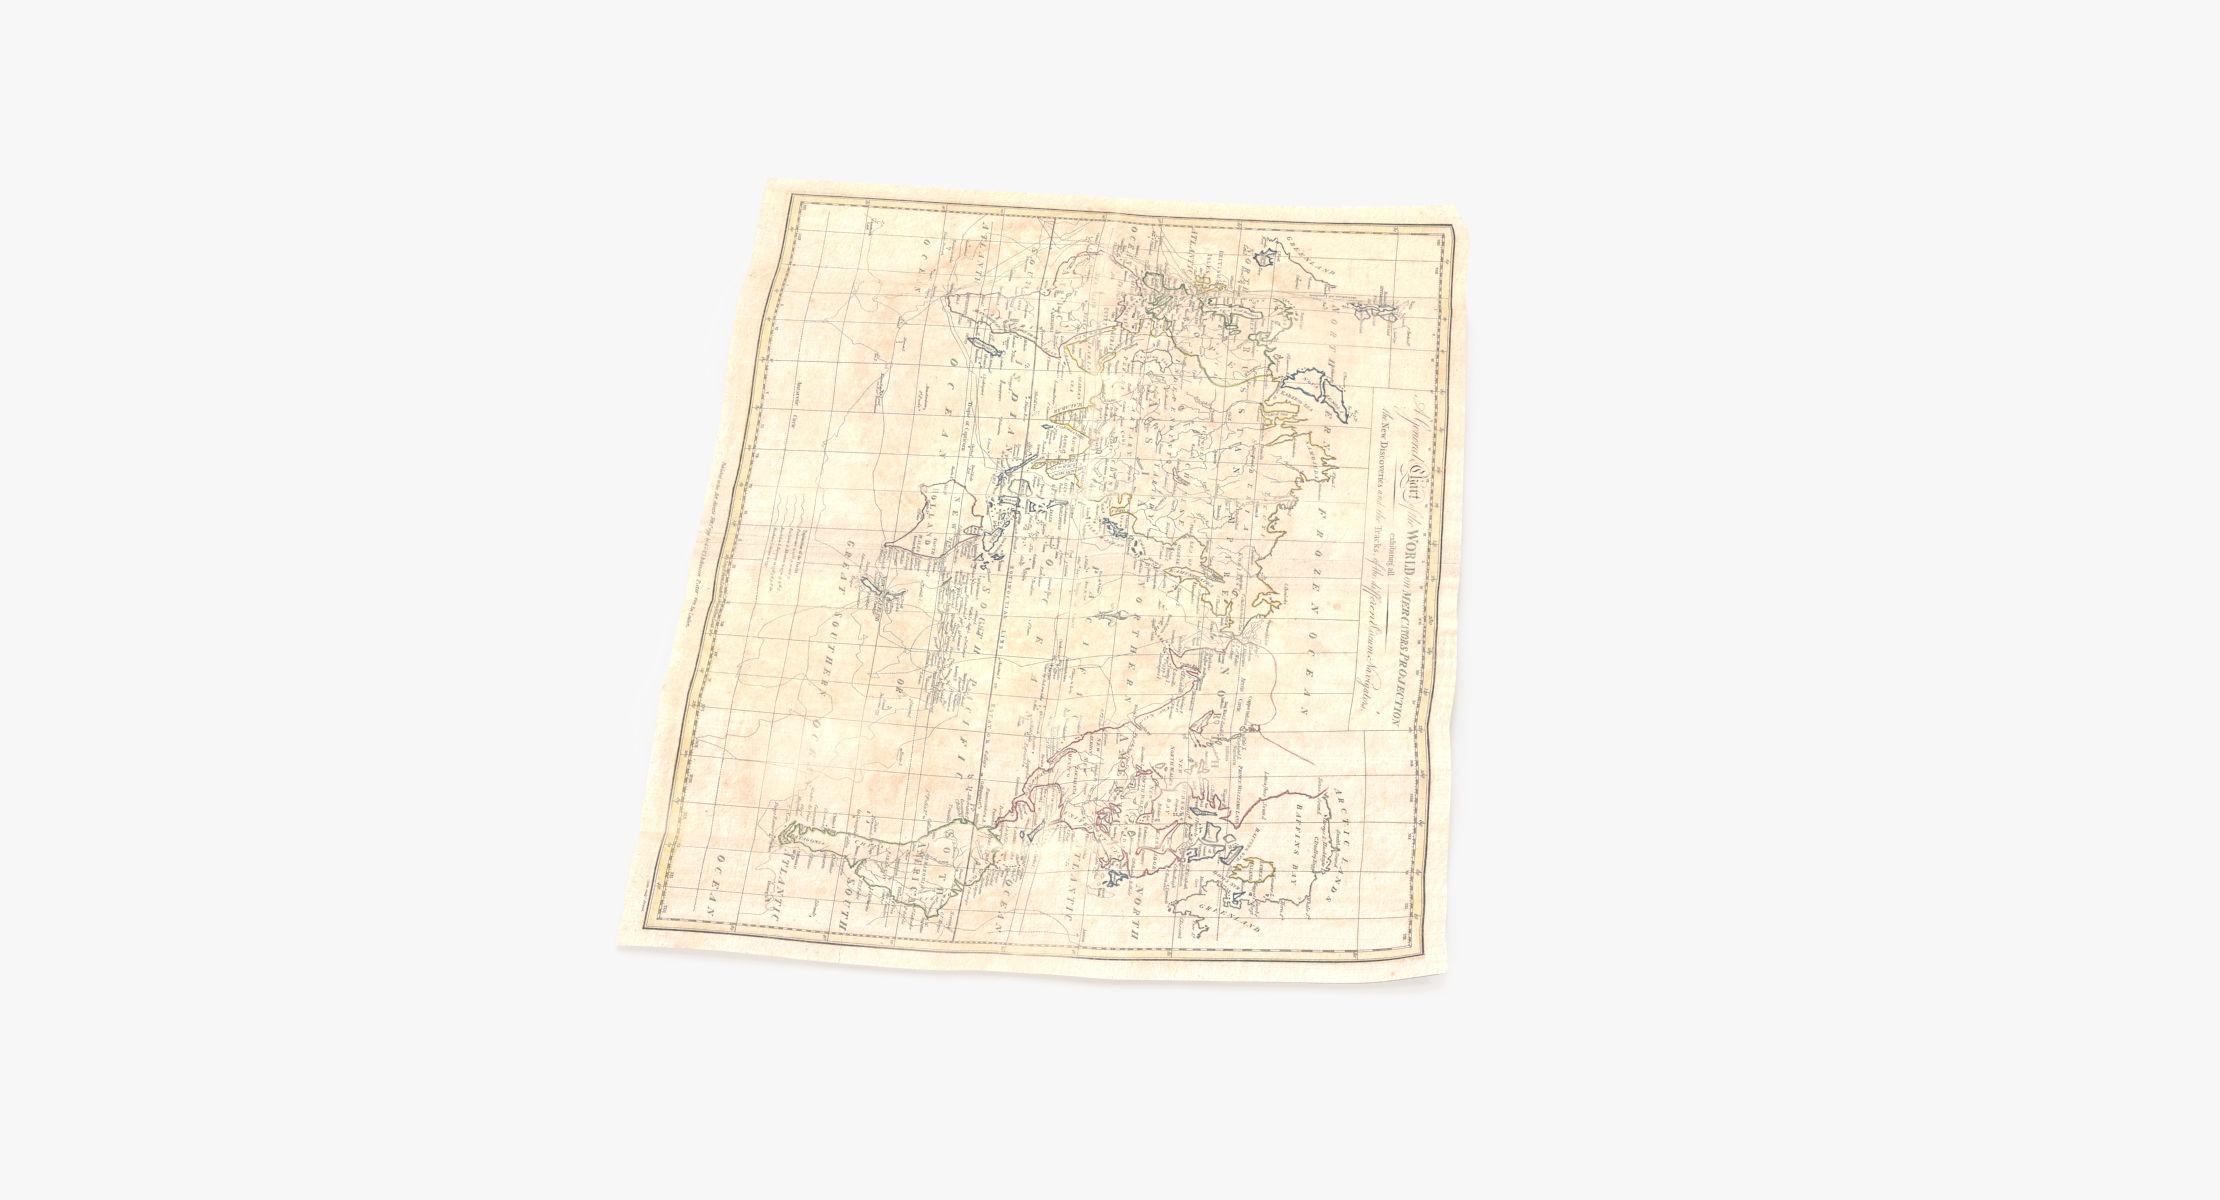 Retro Map 01 04 - reel 1